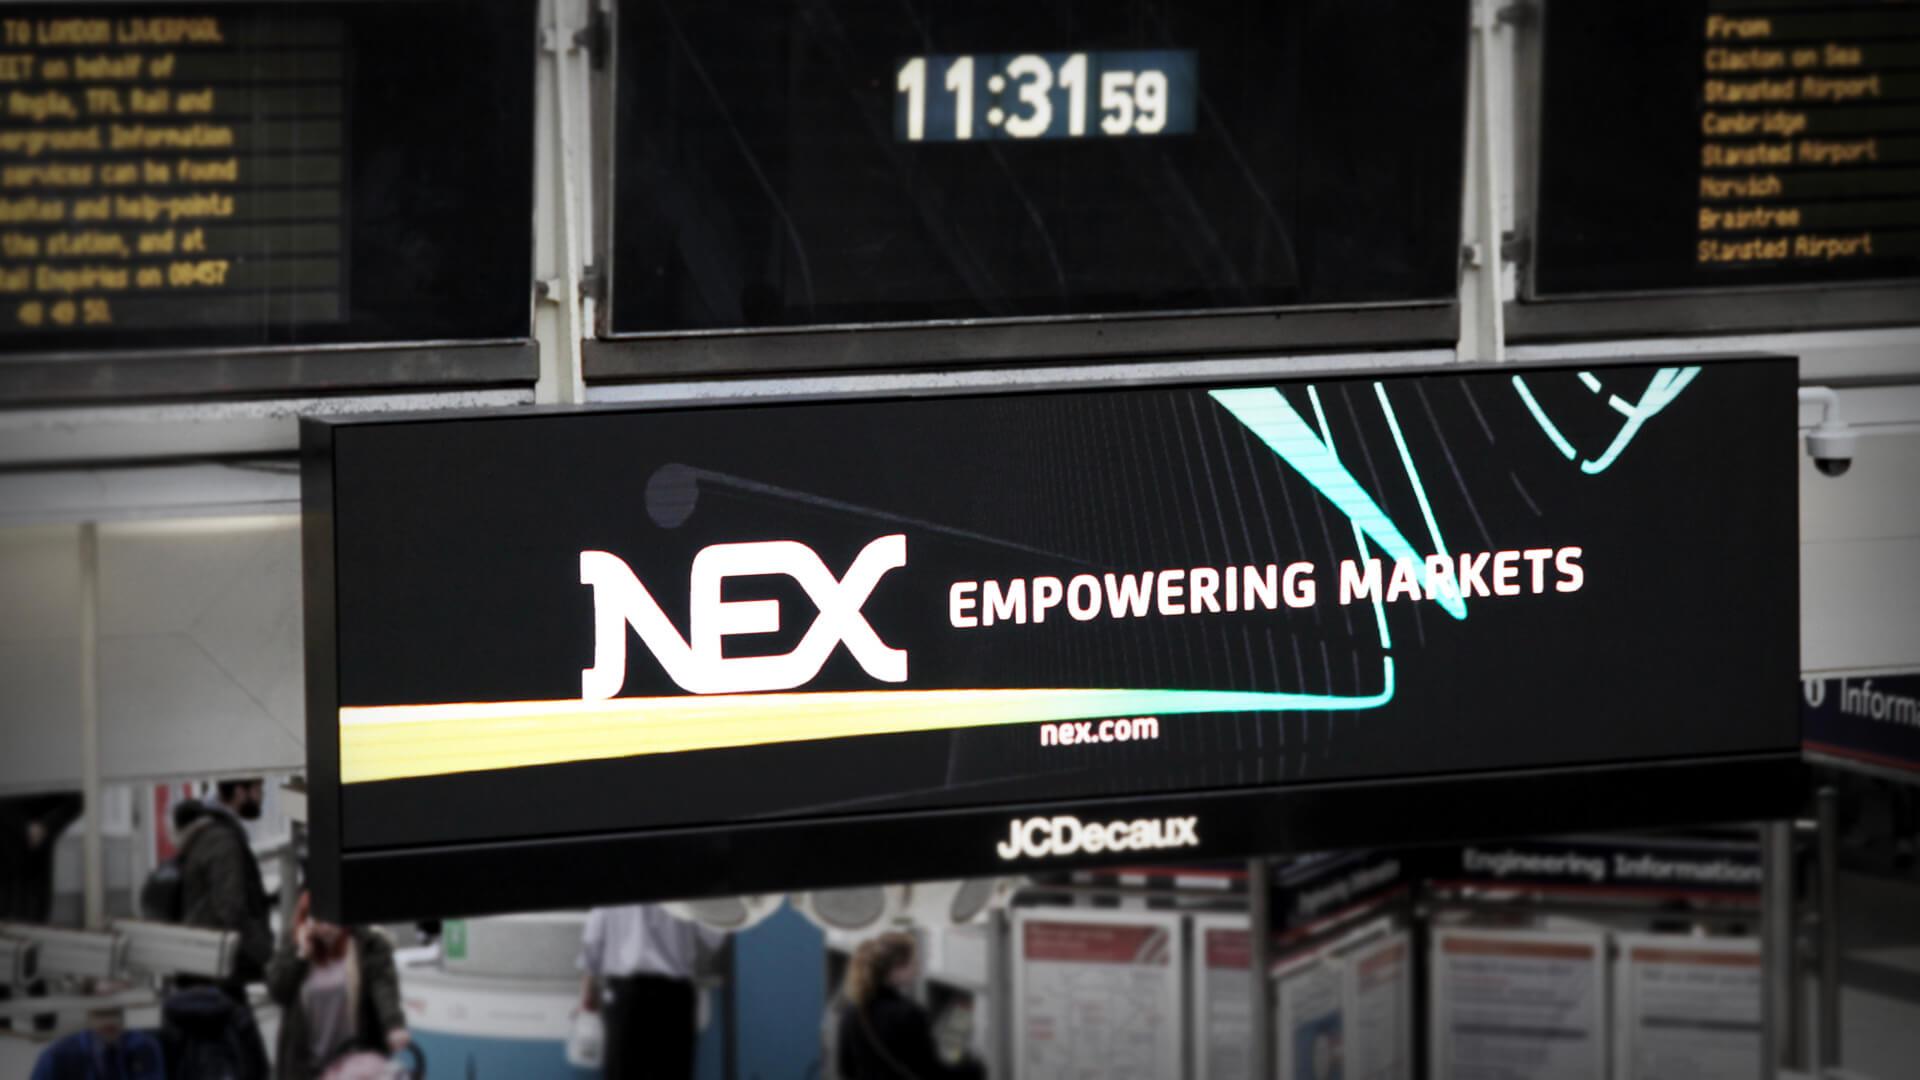 nex advertsing campaign liverpool street station